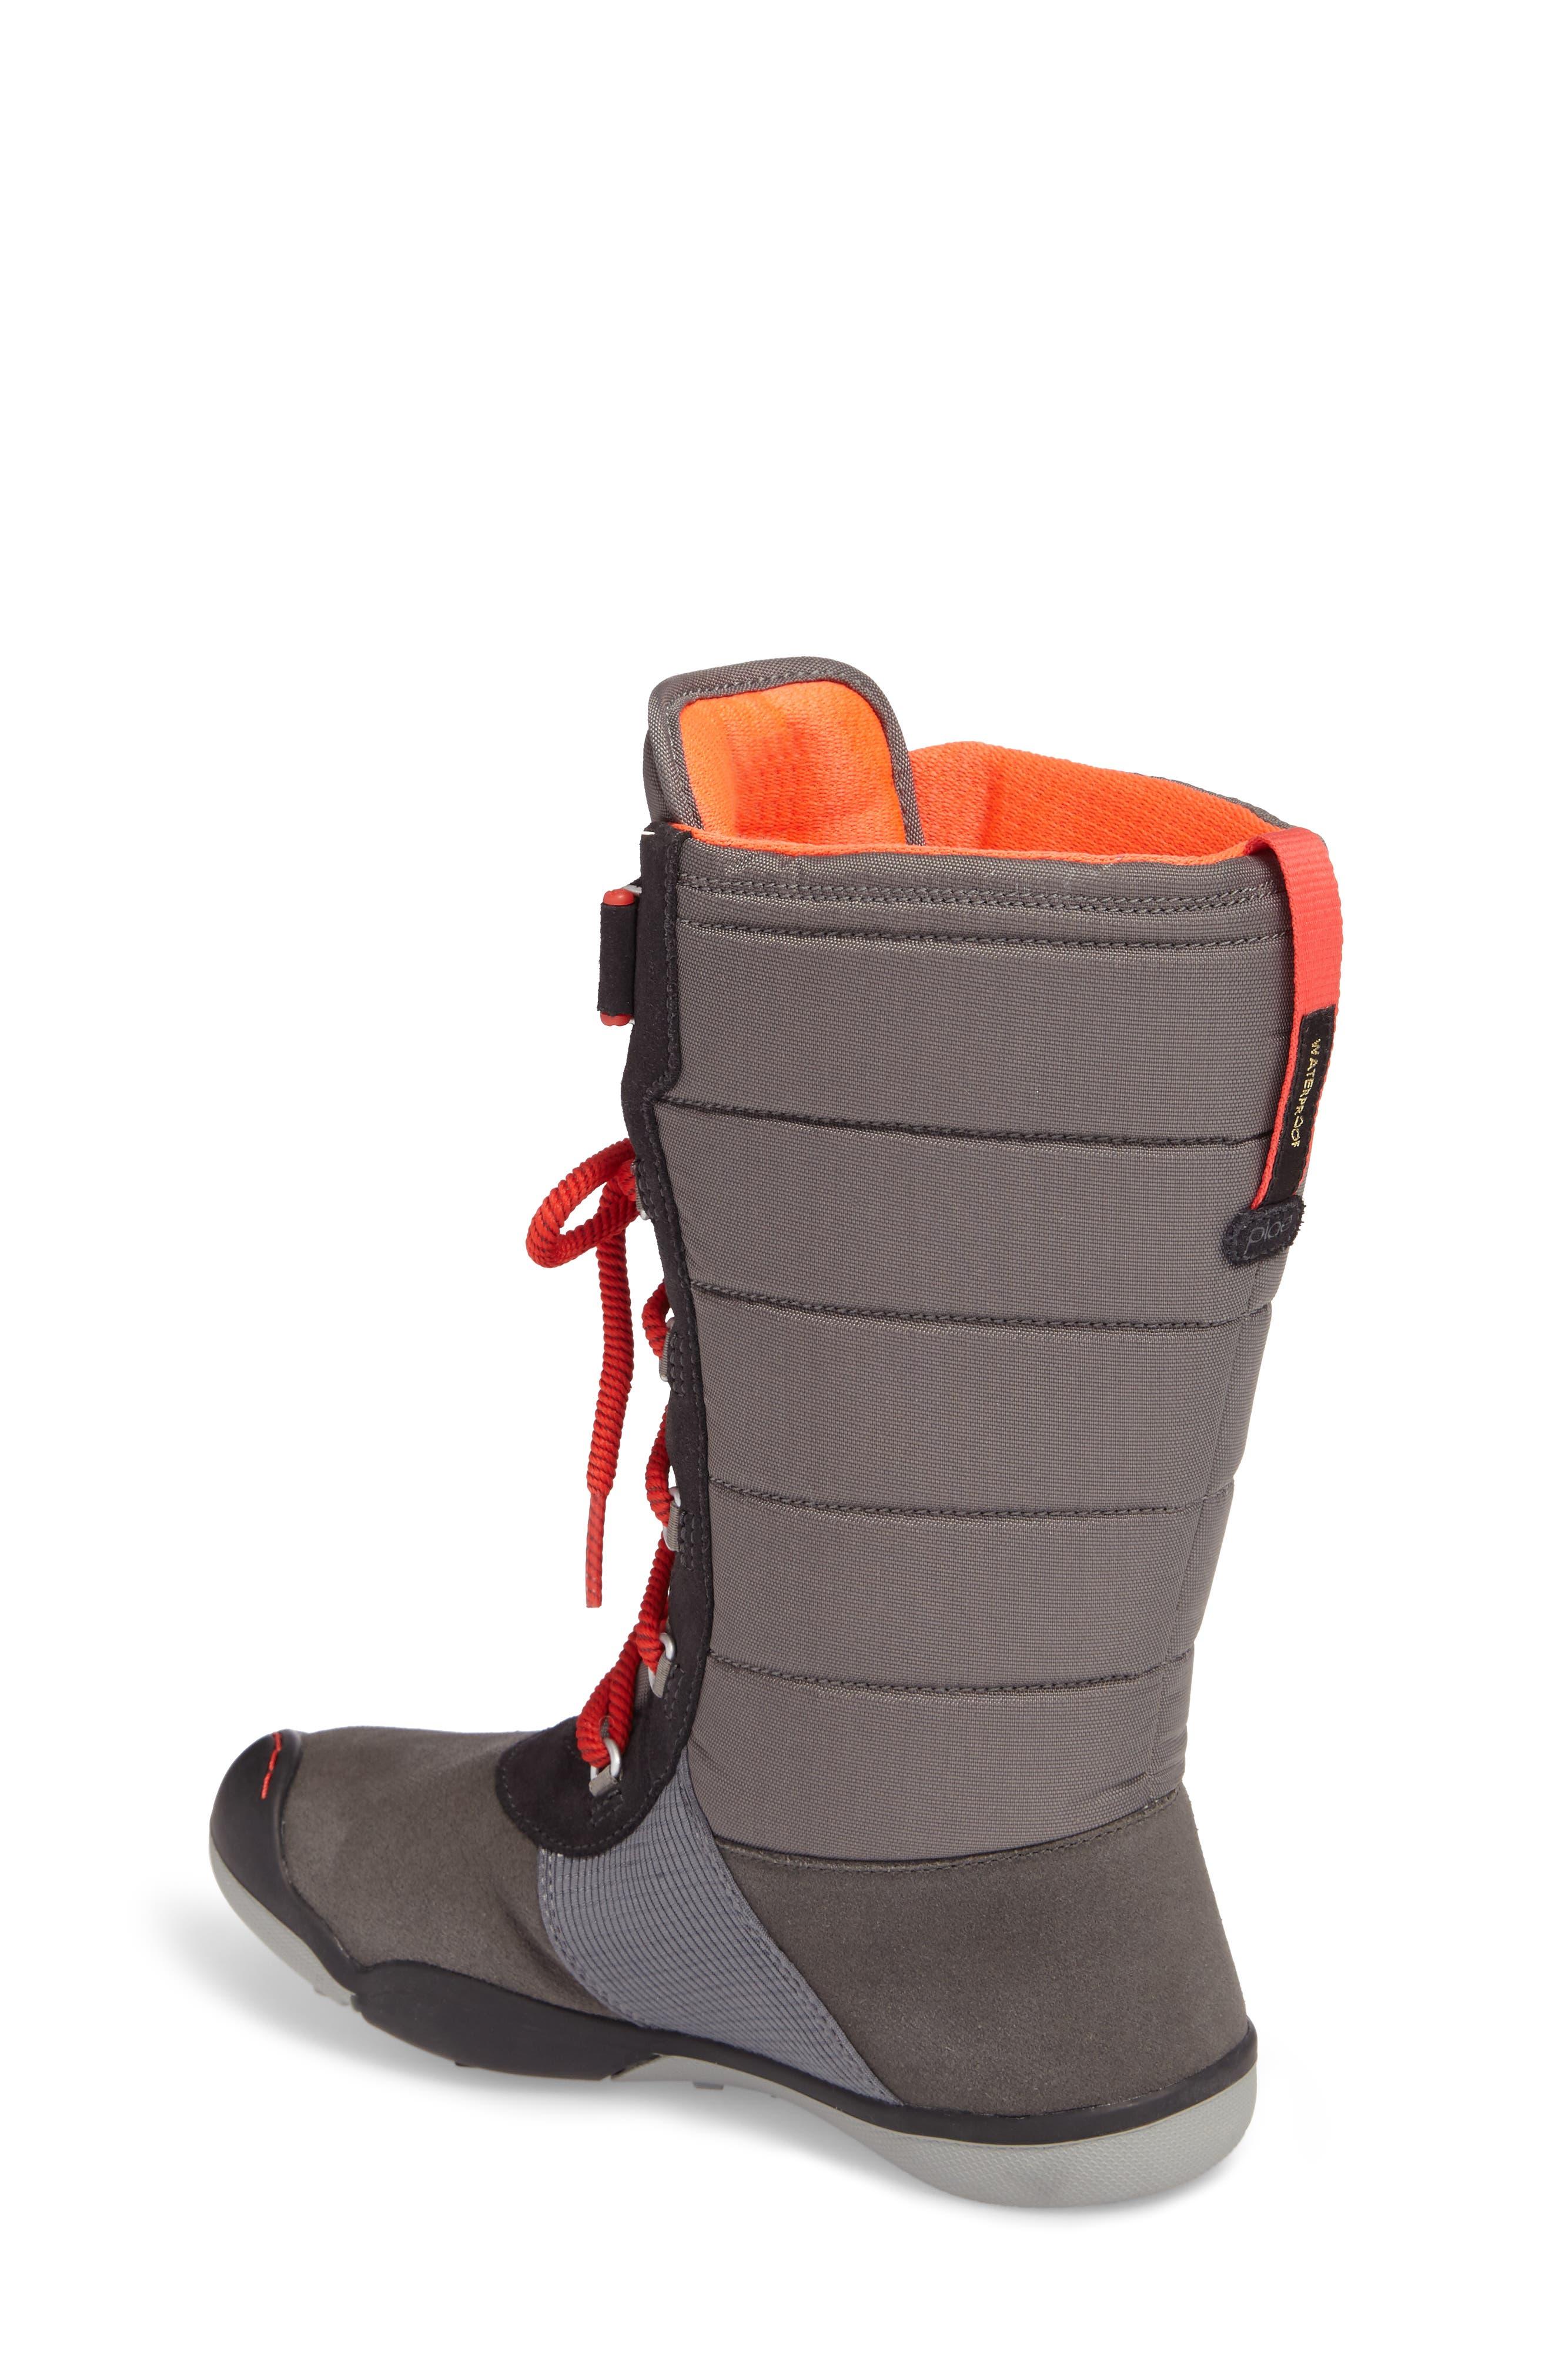 Jack Customizable Waterproof Boot,                             Alternate thumbnail 2, color,                             DARK